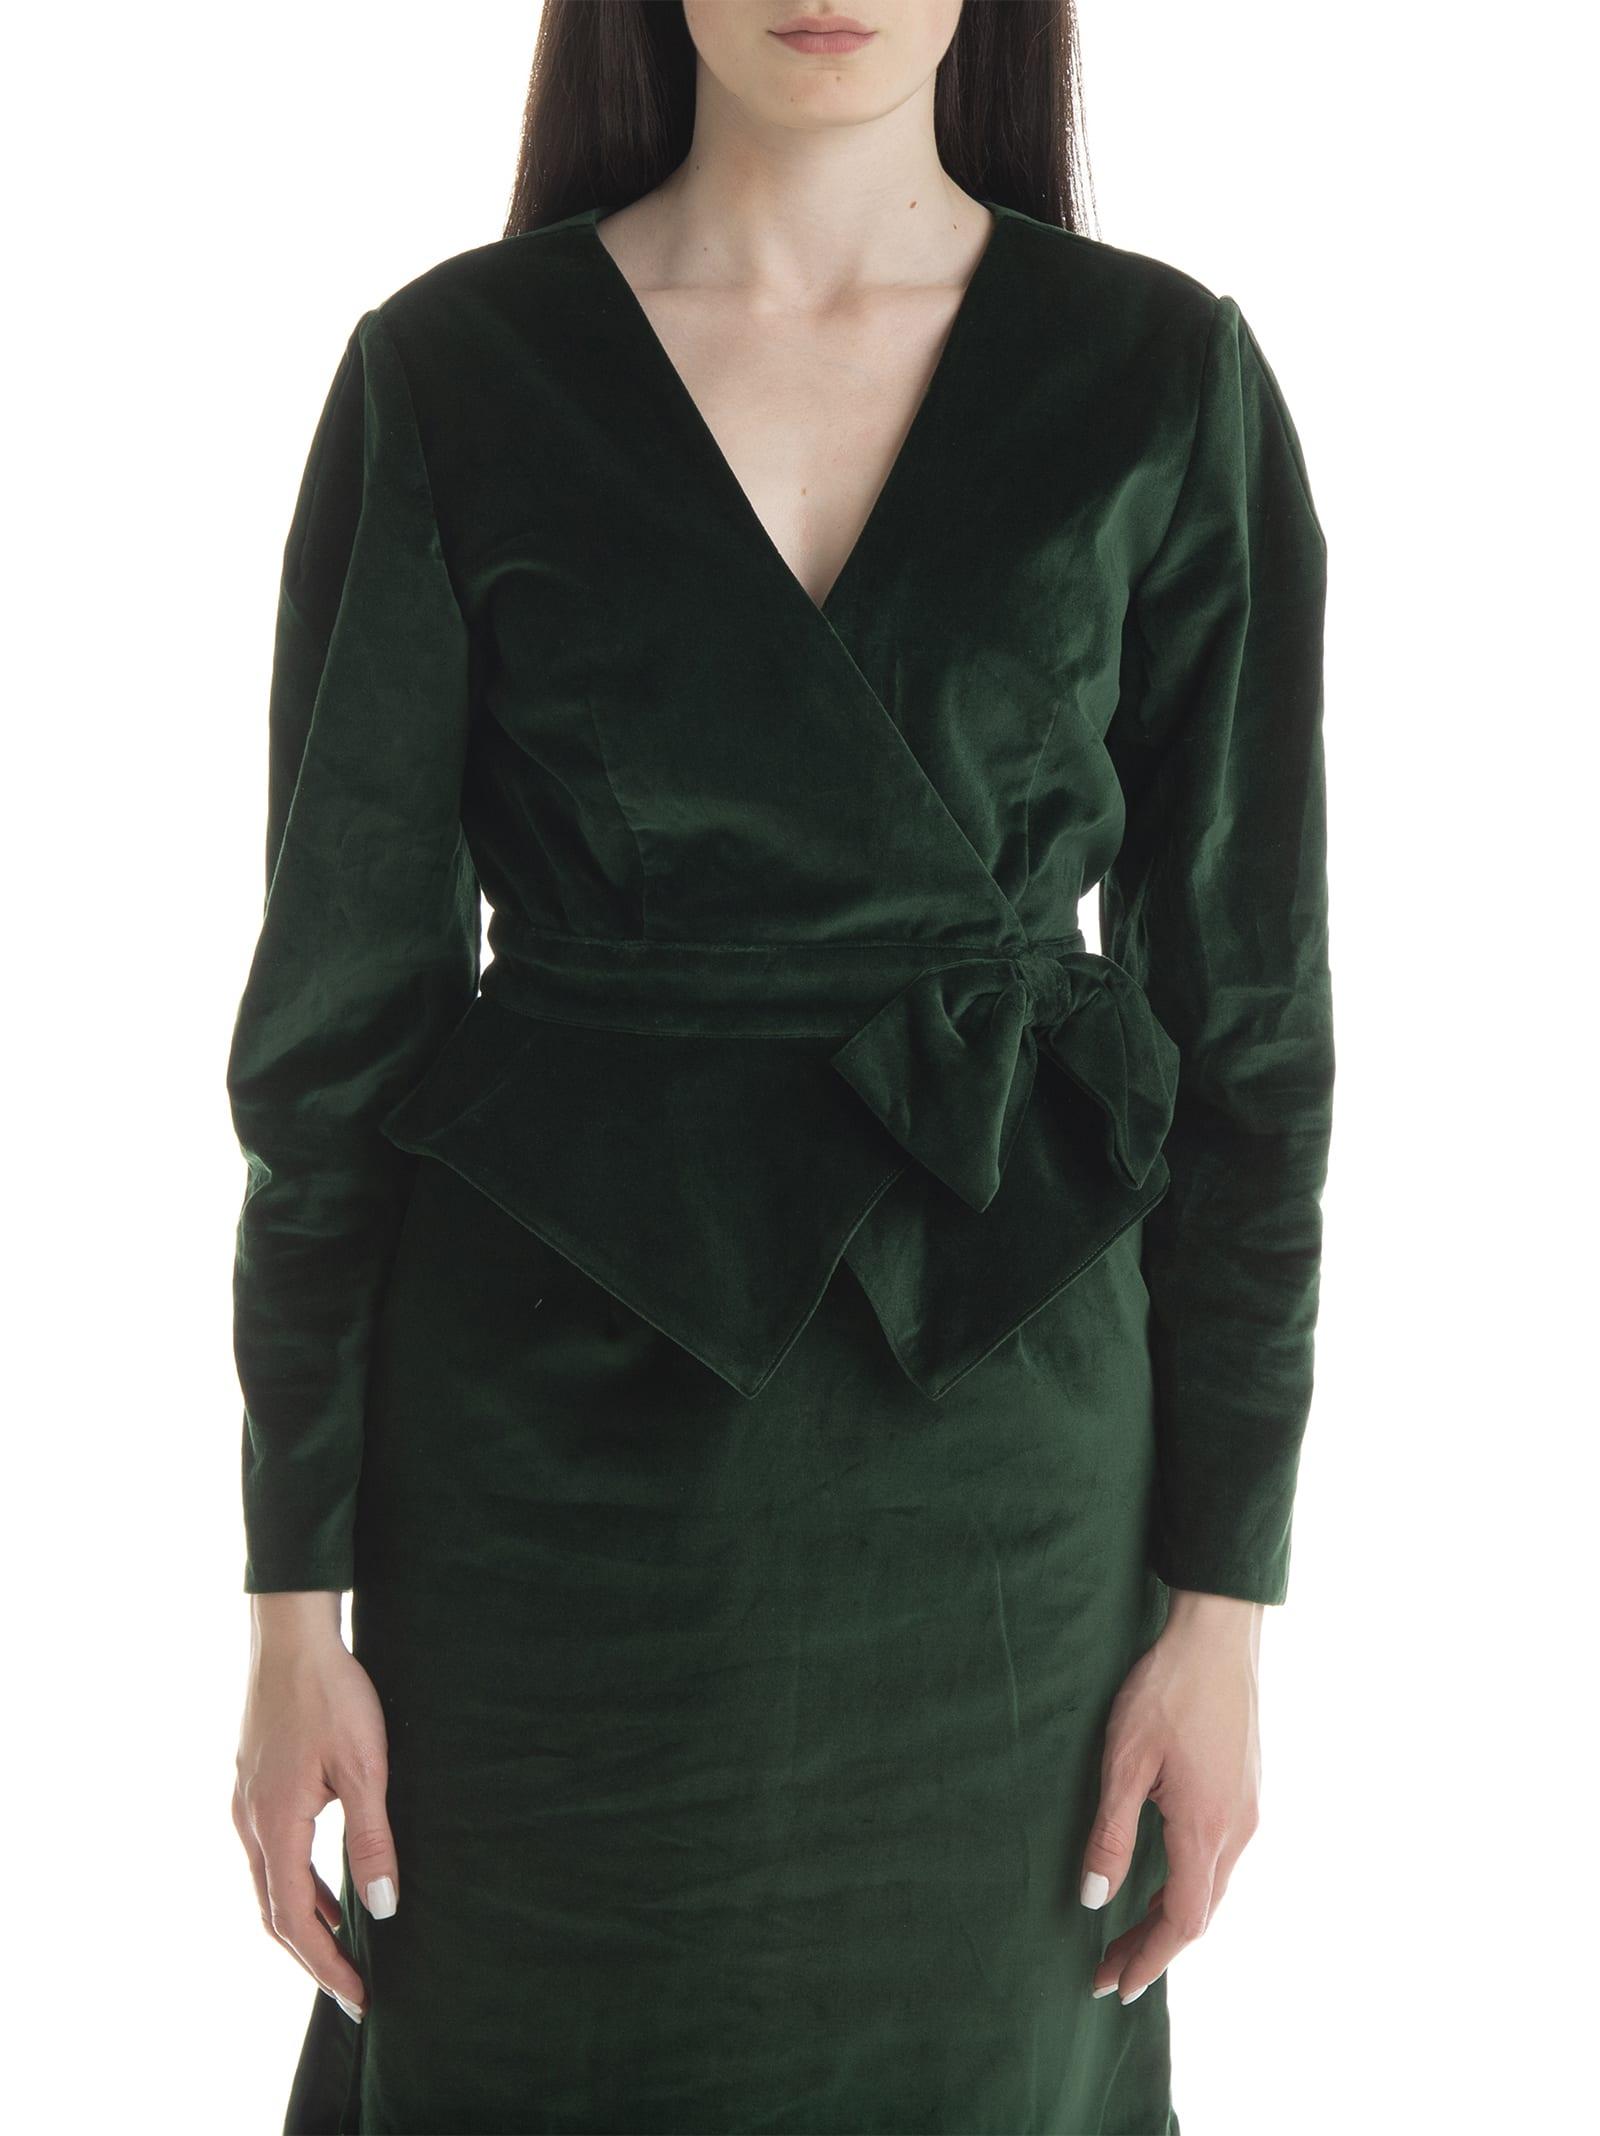 Batsheva Bow Suit Jacket